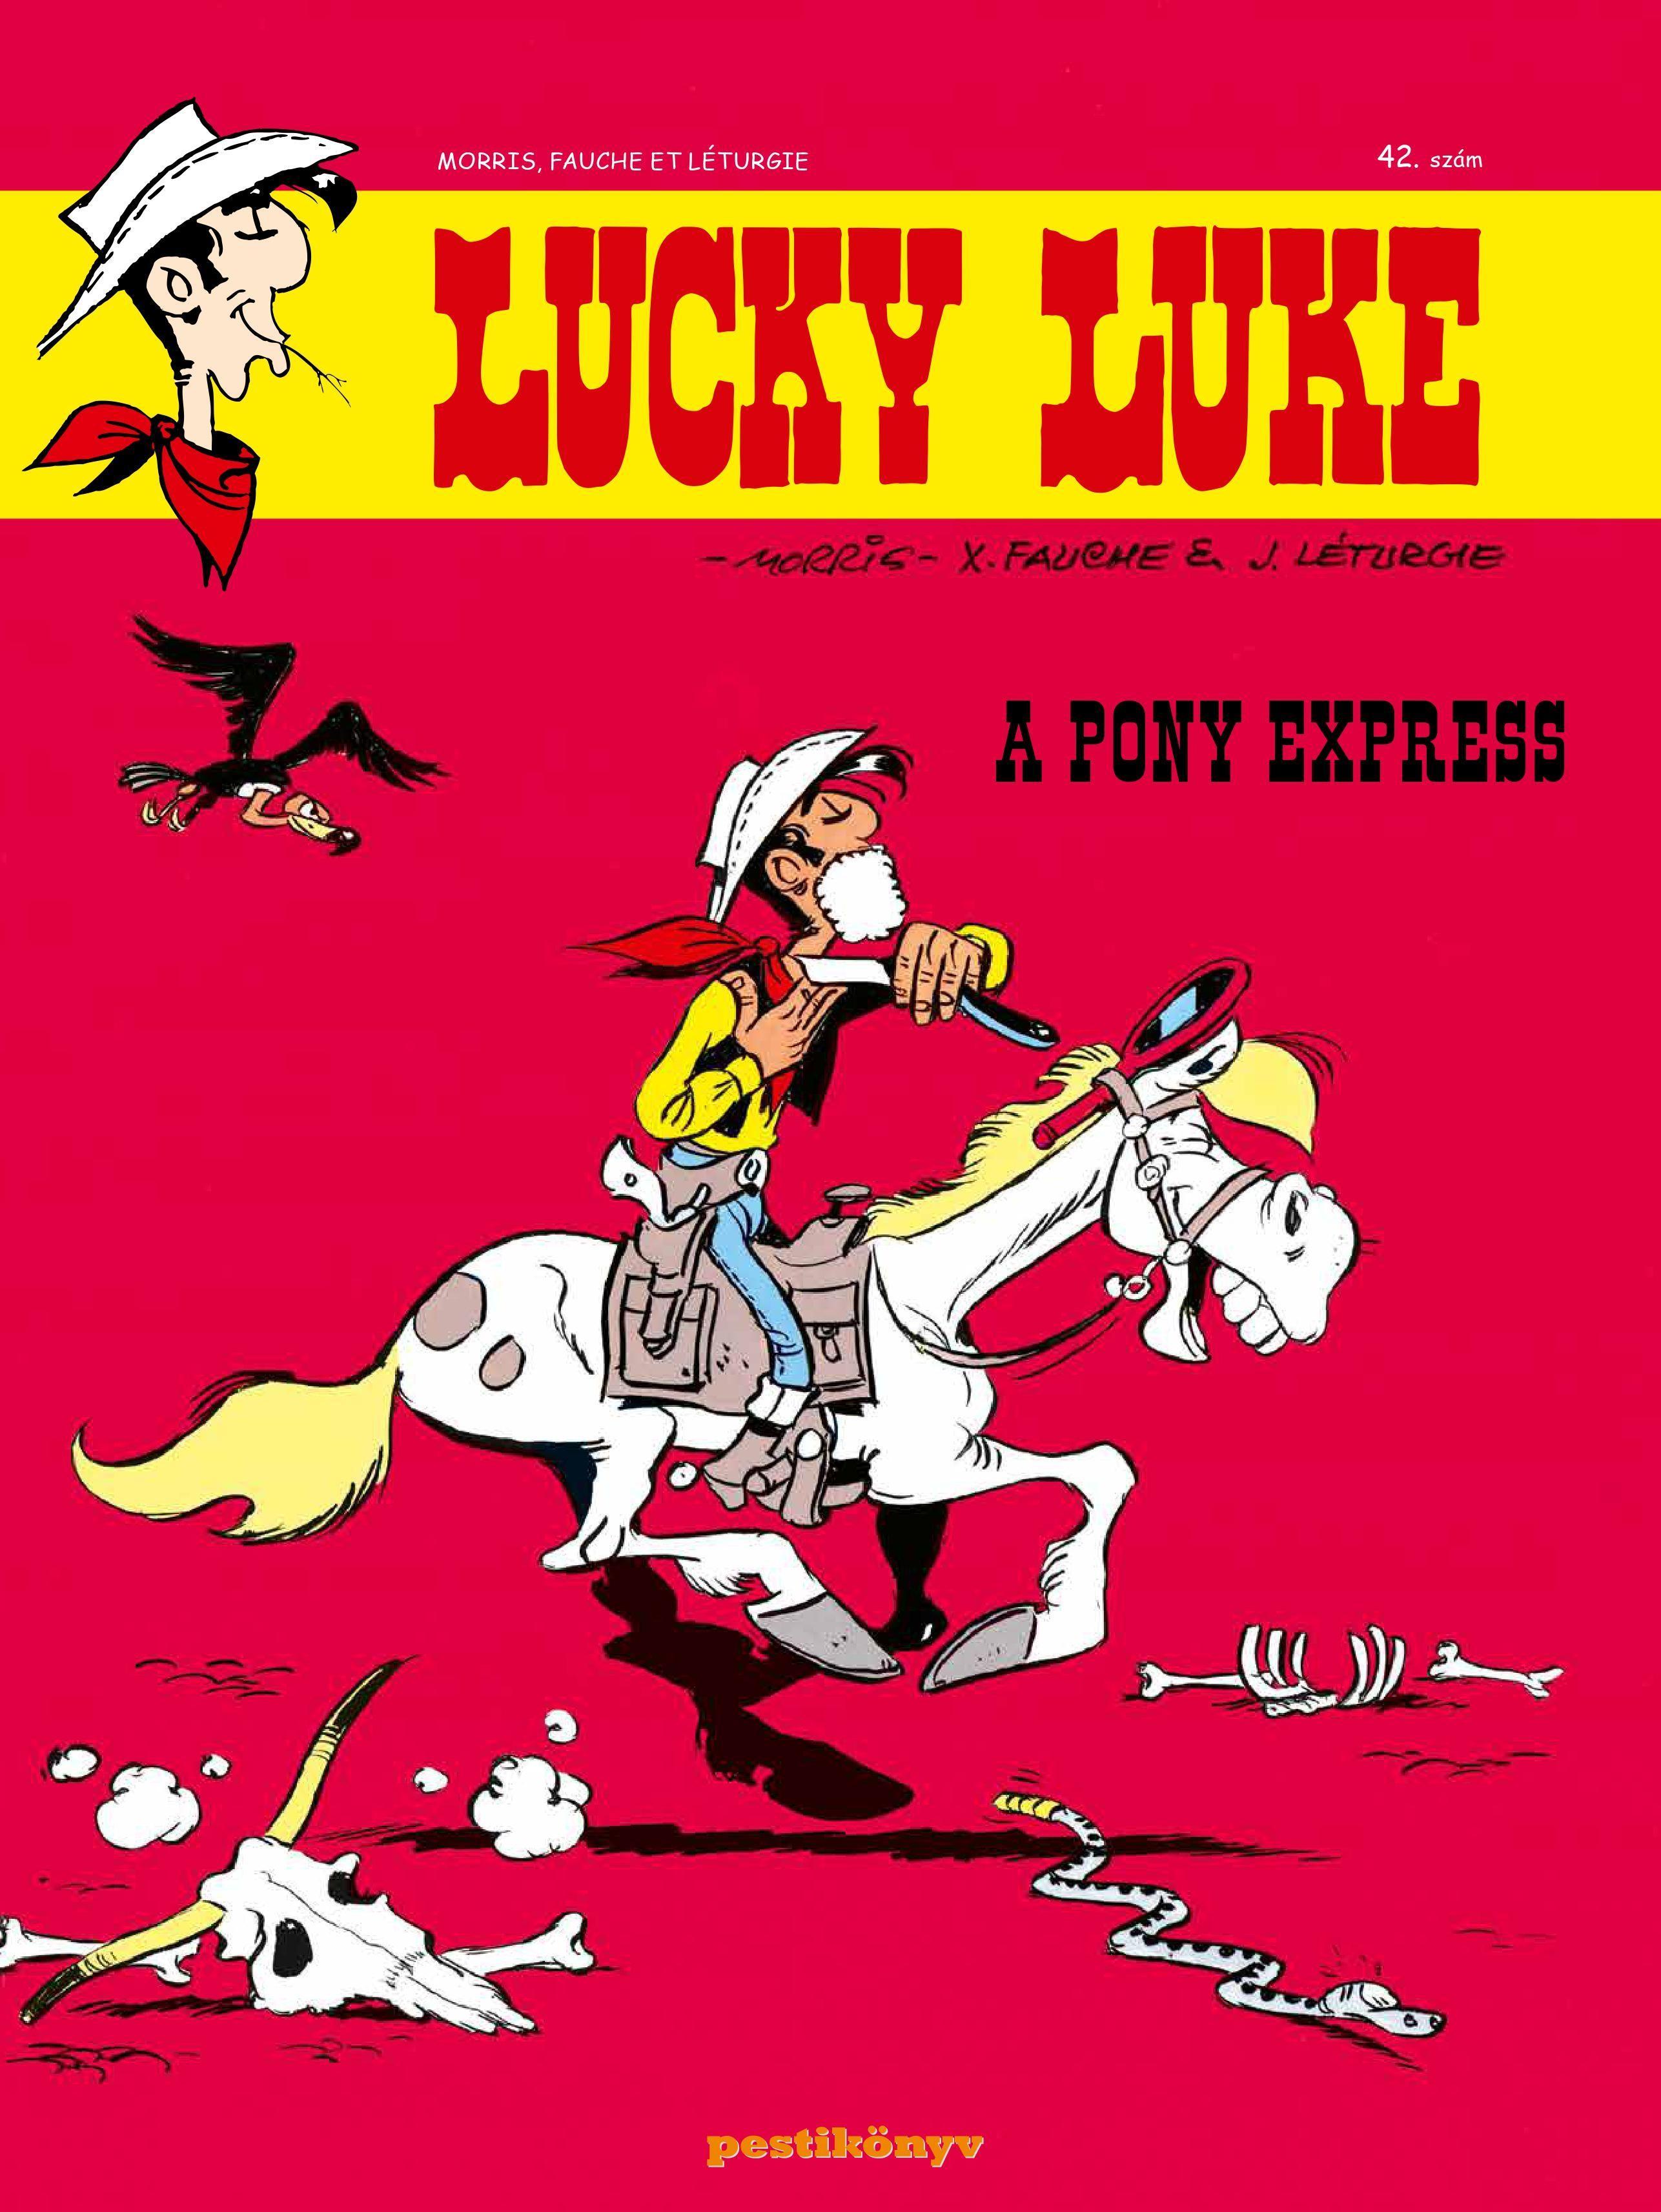 lucky_luke_42_pony_express.jpg